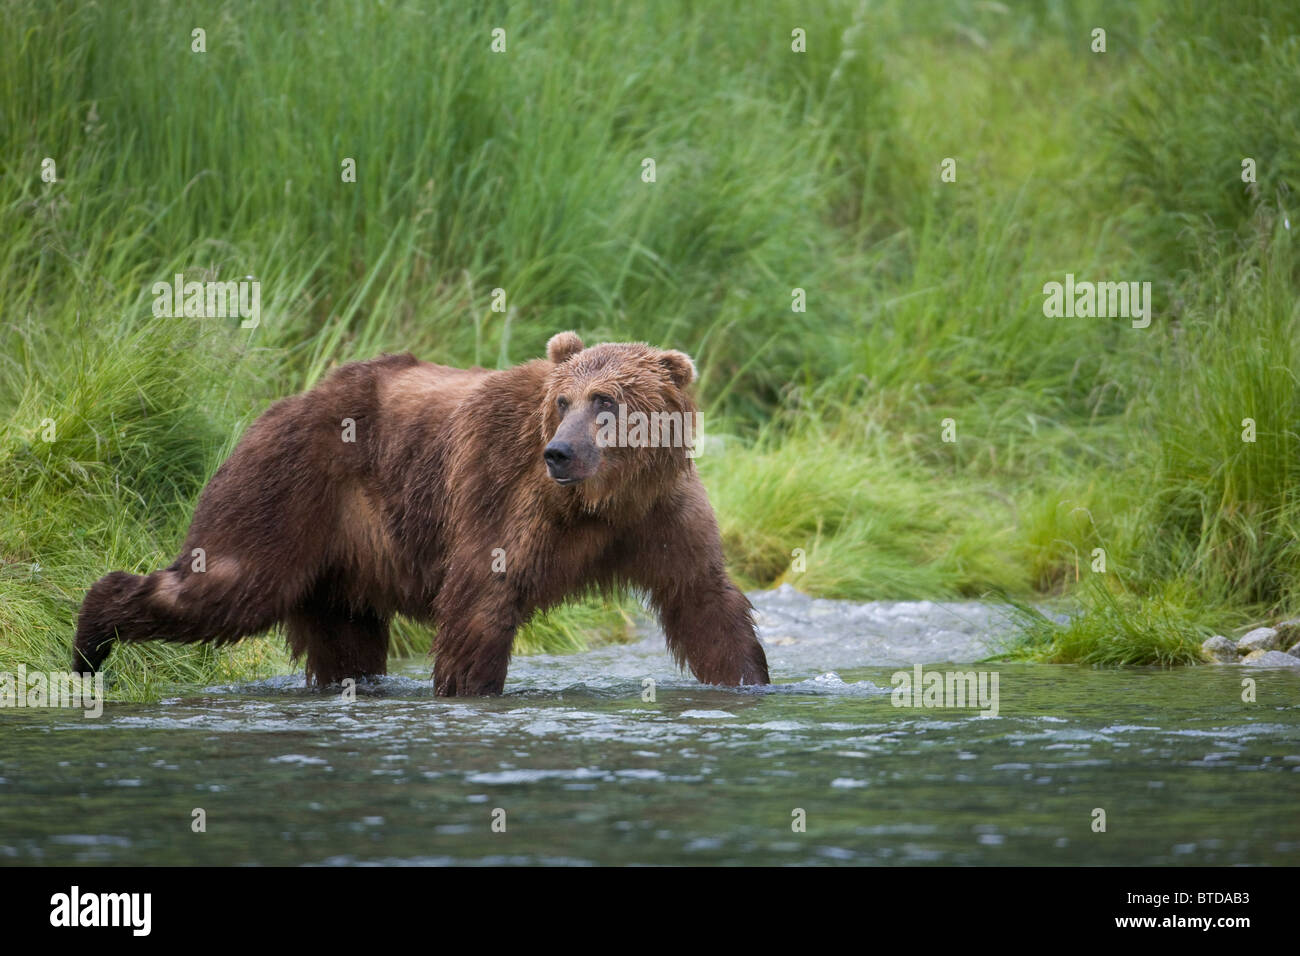 Brown Bear wades through a stream near Prince William Sound, Chugach Mountains, Chugach National Forest, Alaska - Stock Image